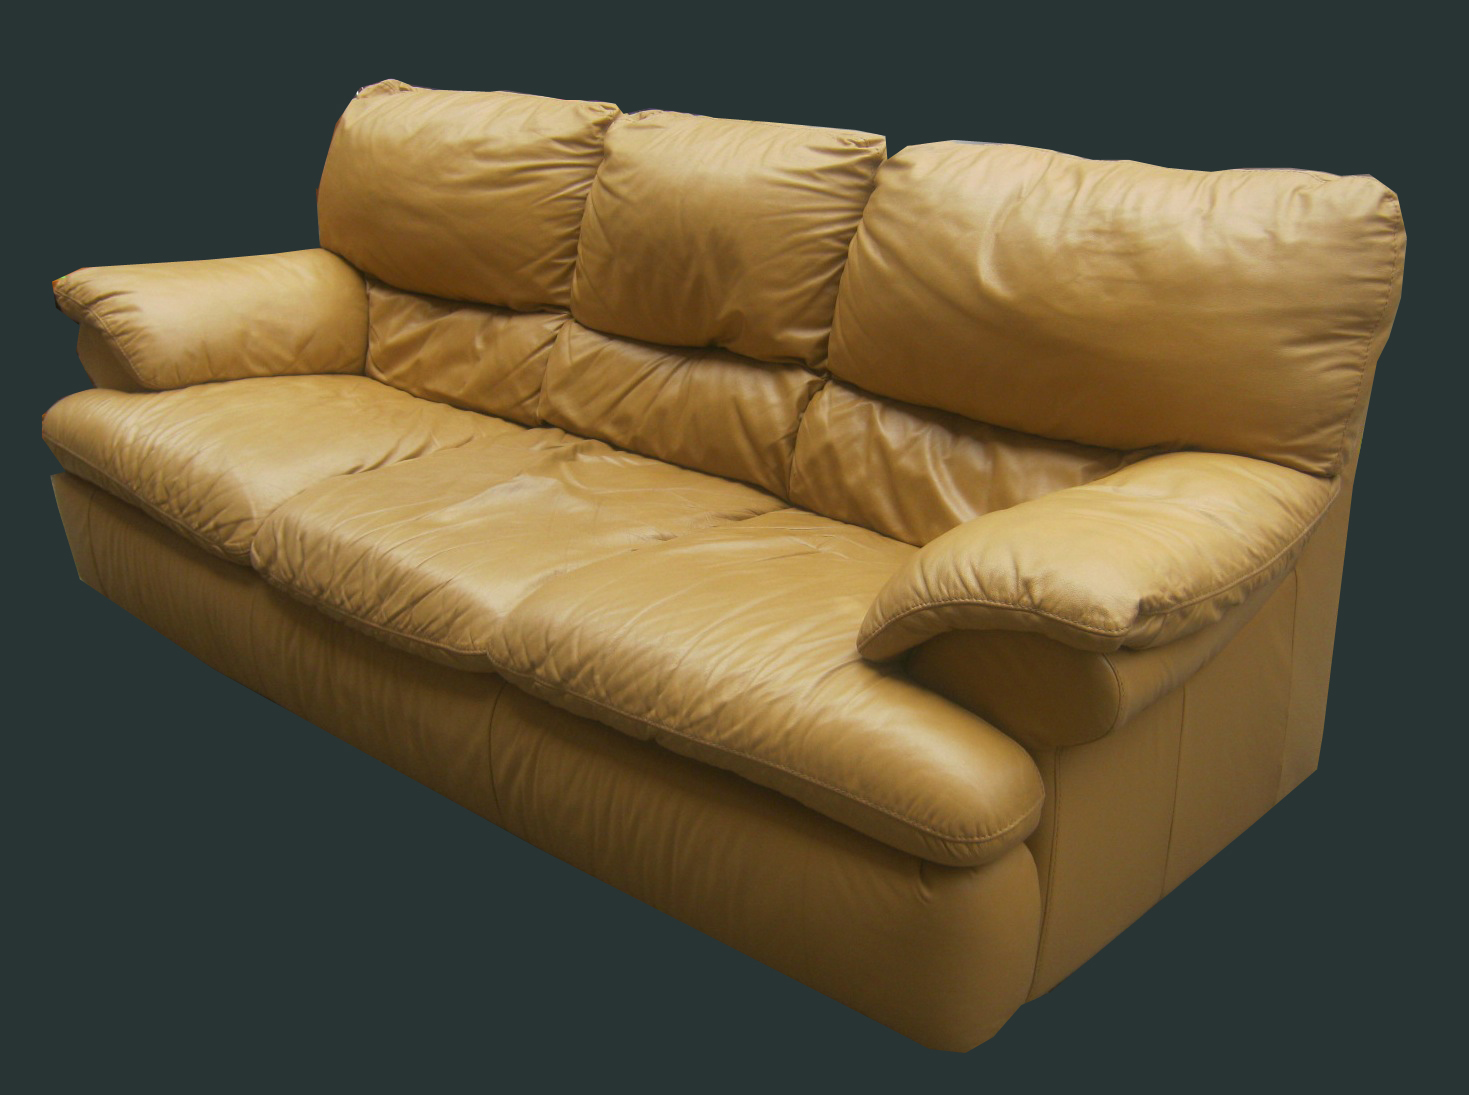 Butterscotch Leather Sofa U0026 Loveseat SOLD